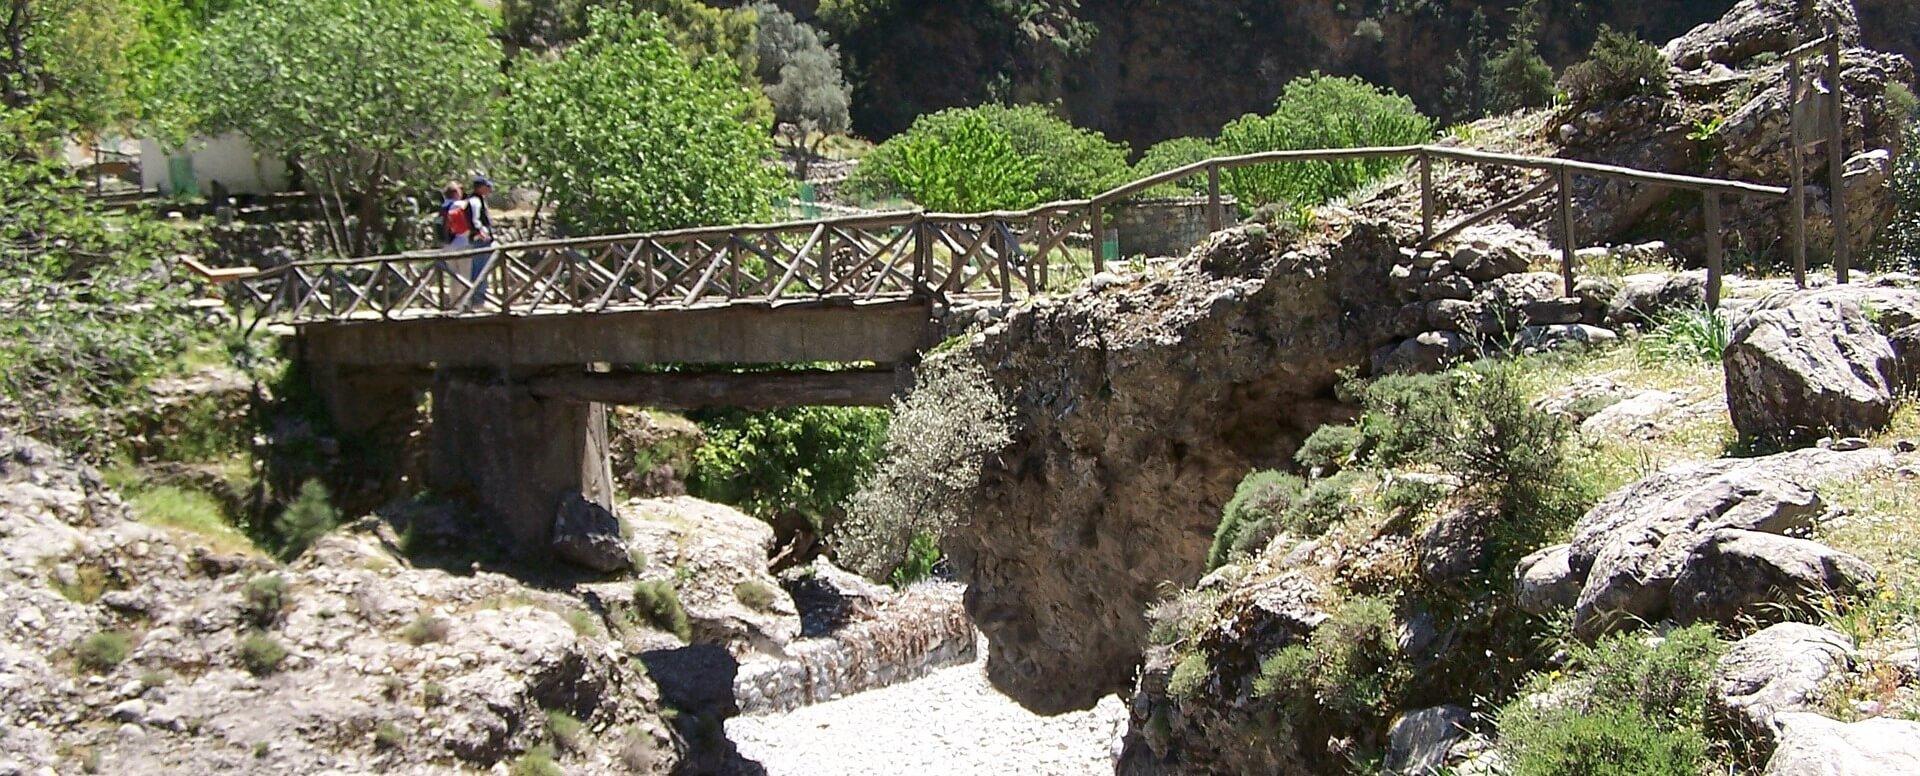 Crete: a paradise for adventurers - Greece